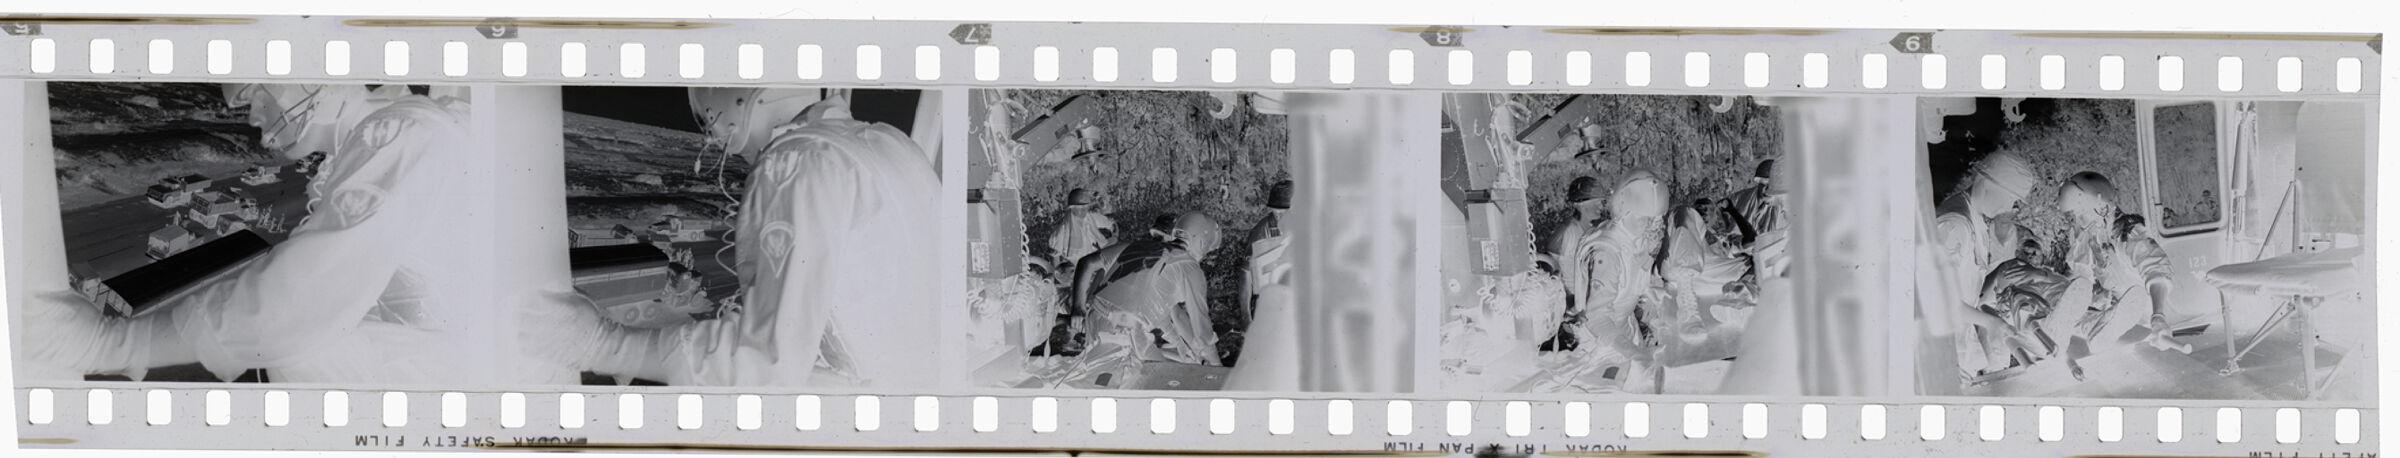 Untitled (57Th Medical Detachment, Vietnam)